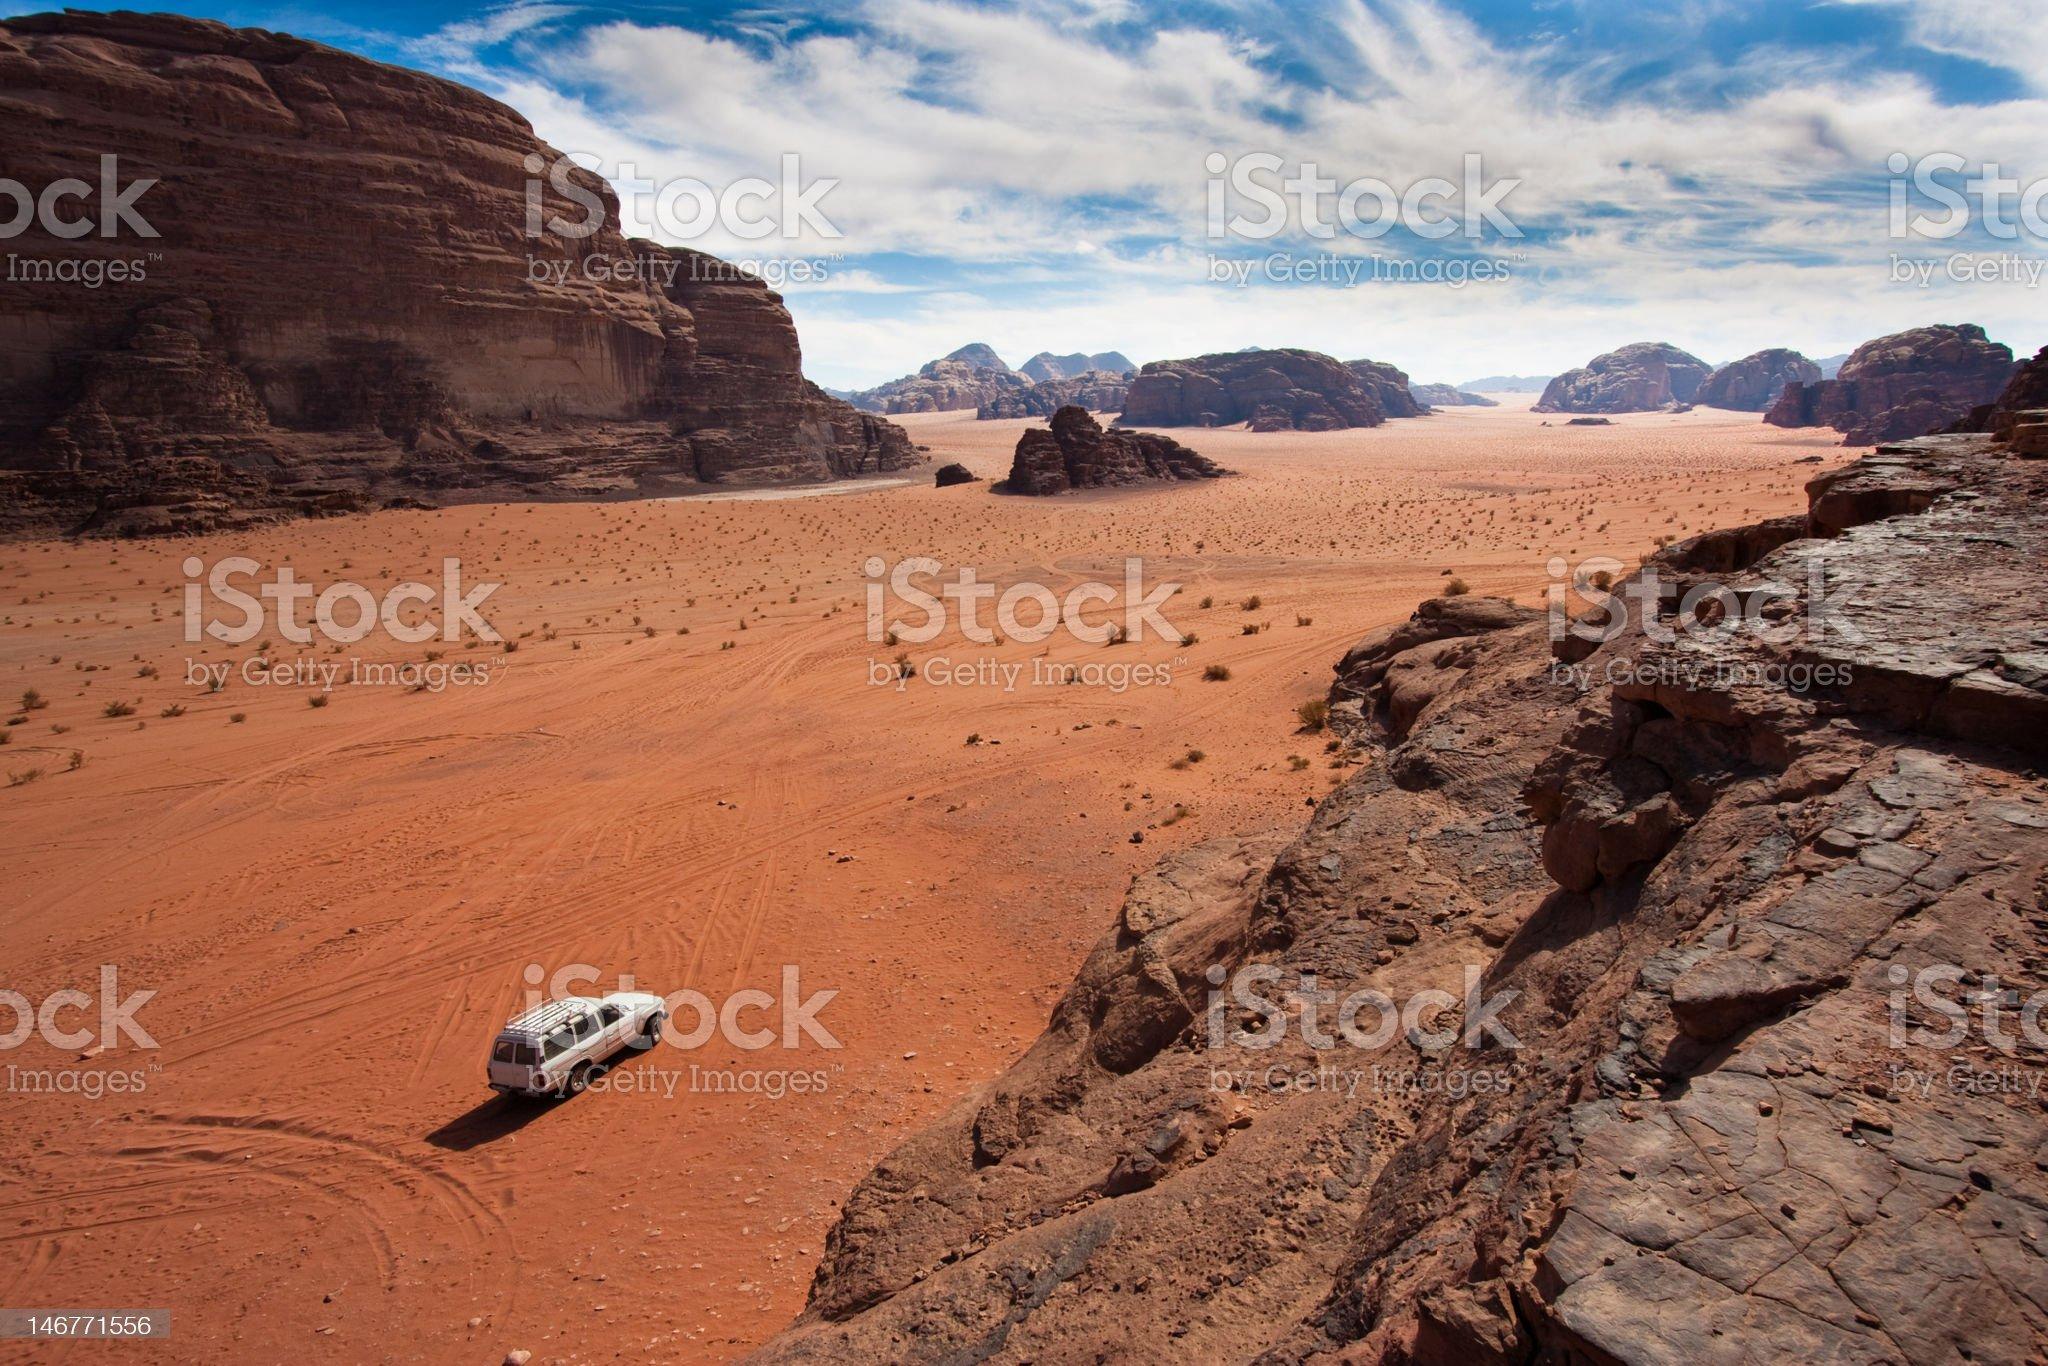 White jeep between the mountains in Wadi Rum, Jordan. royalty-free stock photo